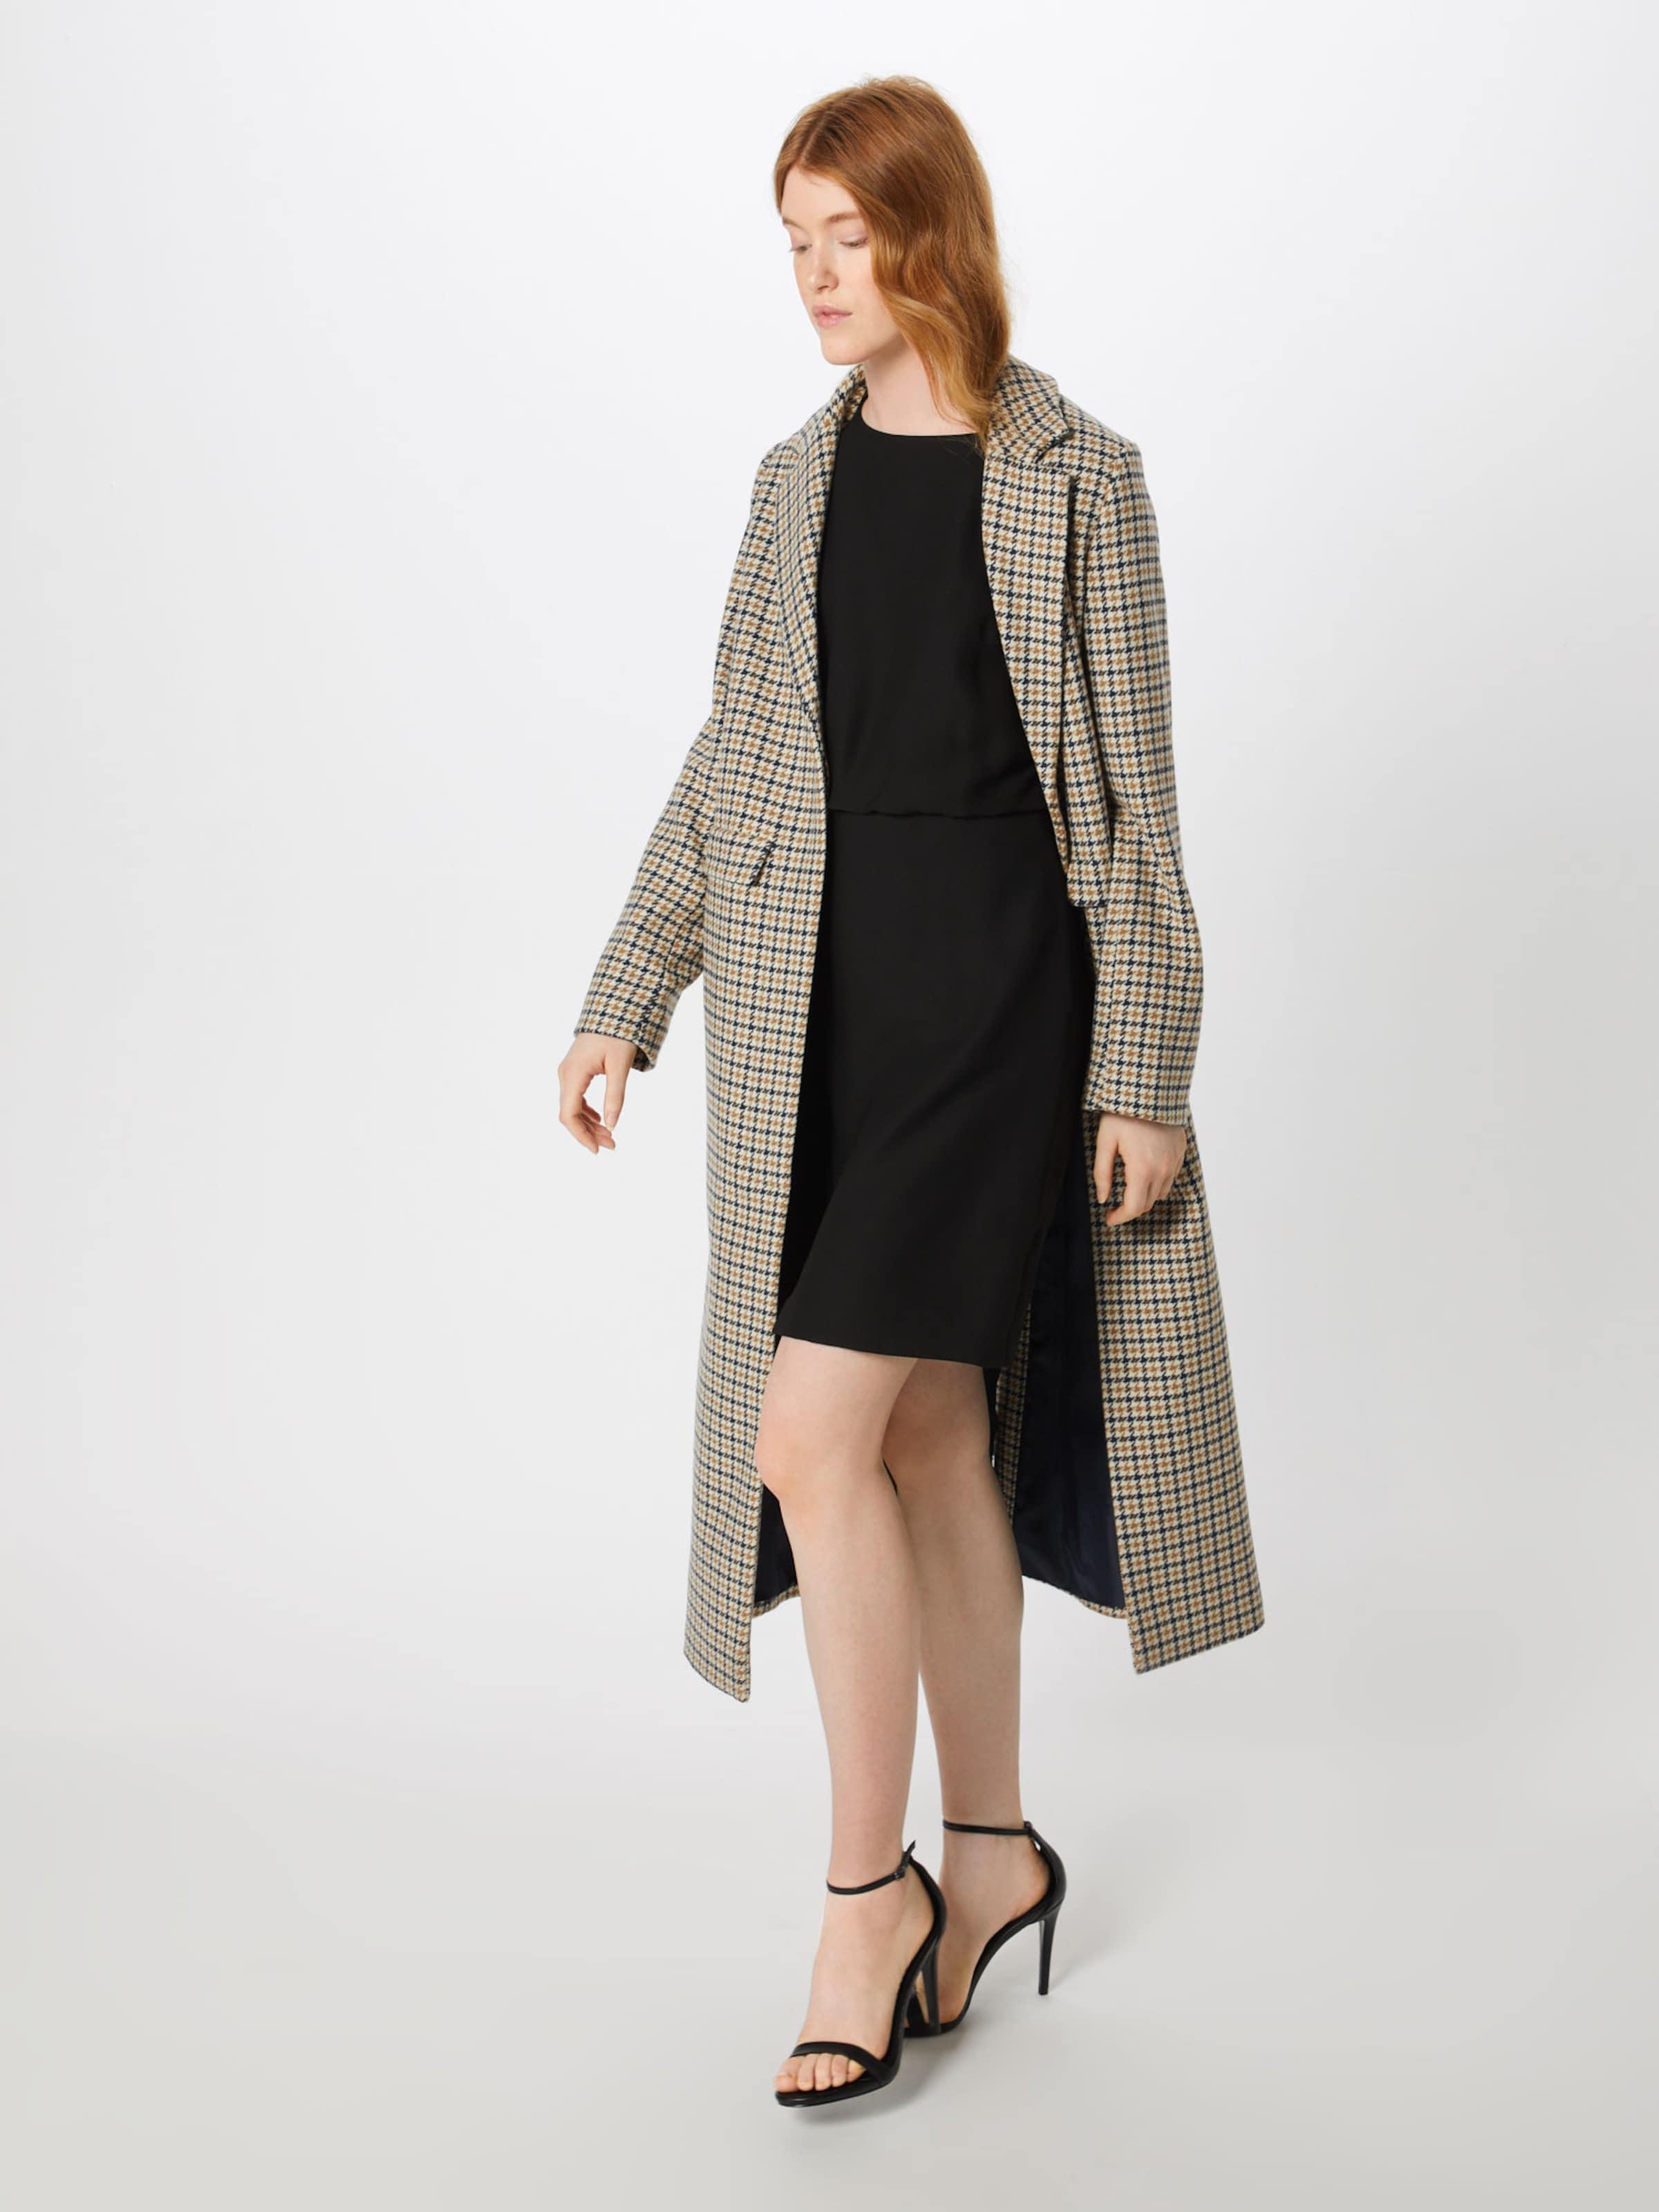 'ss Drape Dress' Back Republic Robe En Fnf Banana Noir fgvyYb76mI